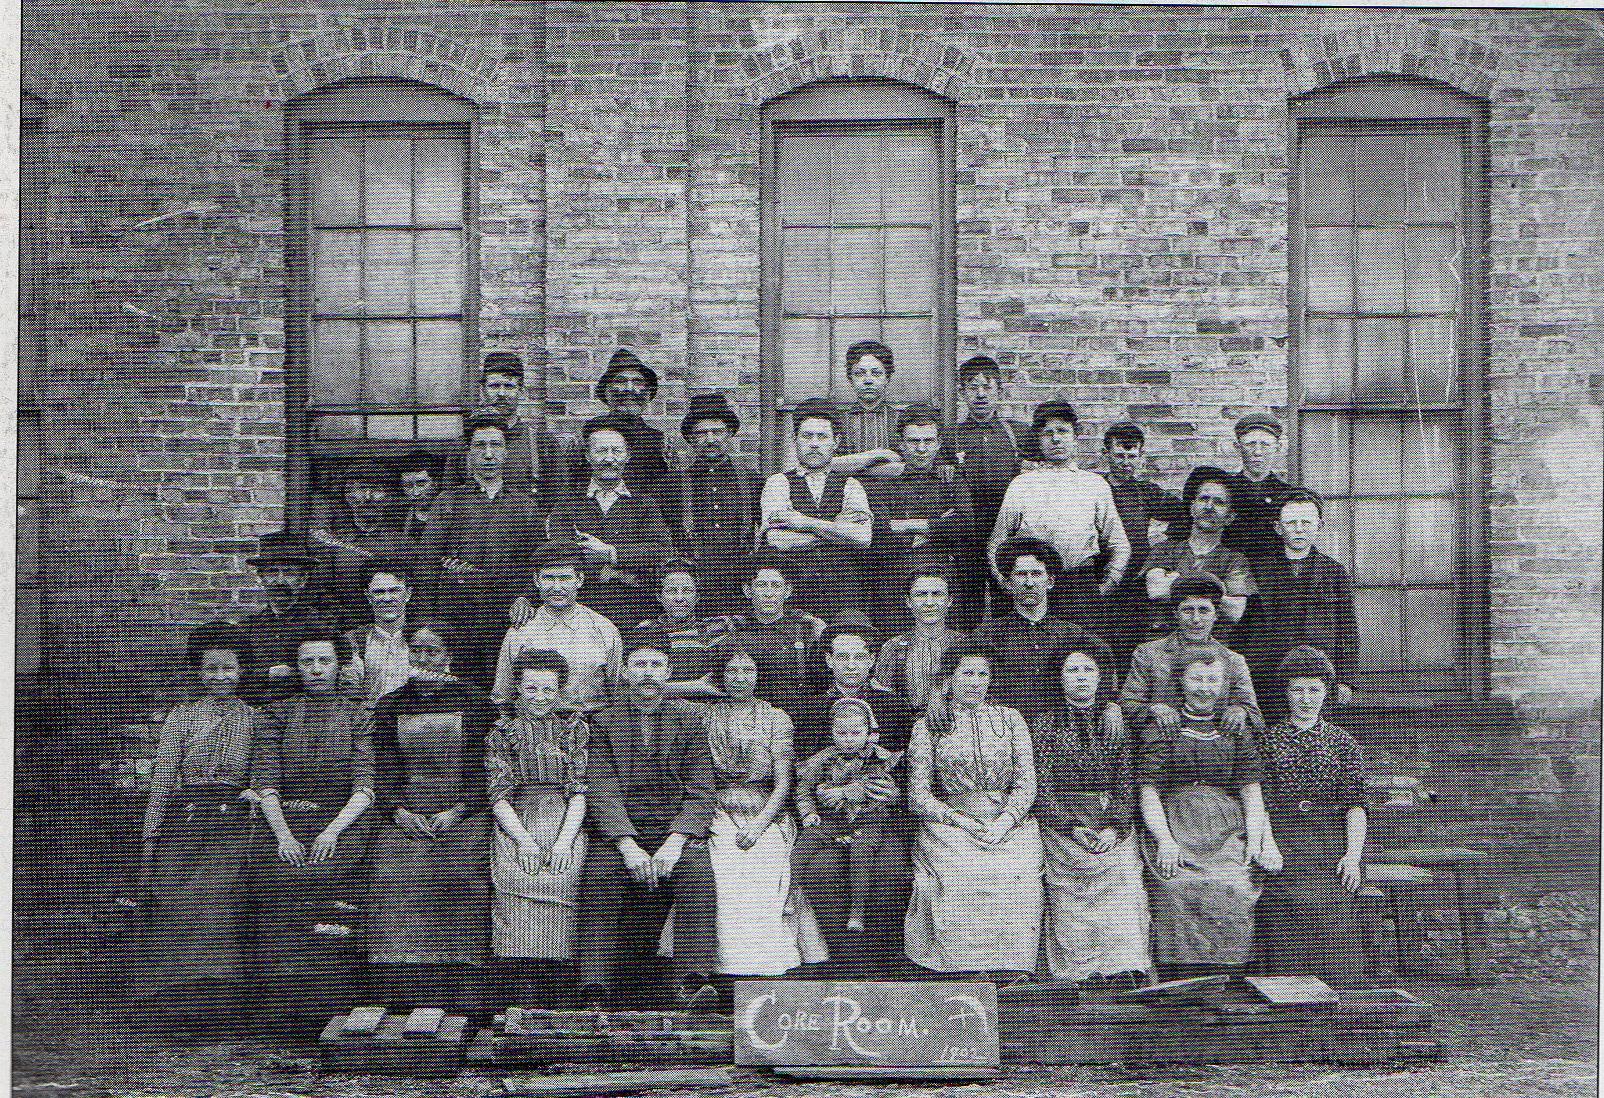 Fabrica de Hierro Saint Charles 2